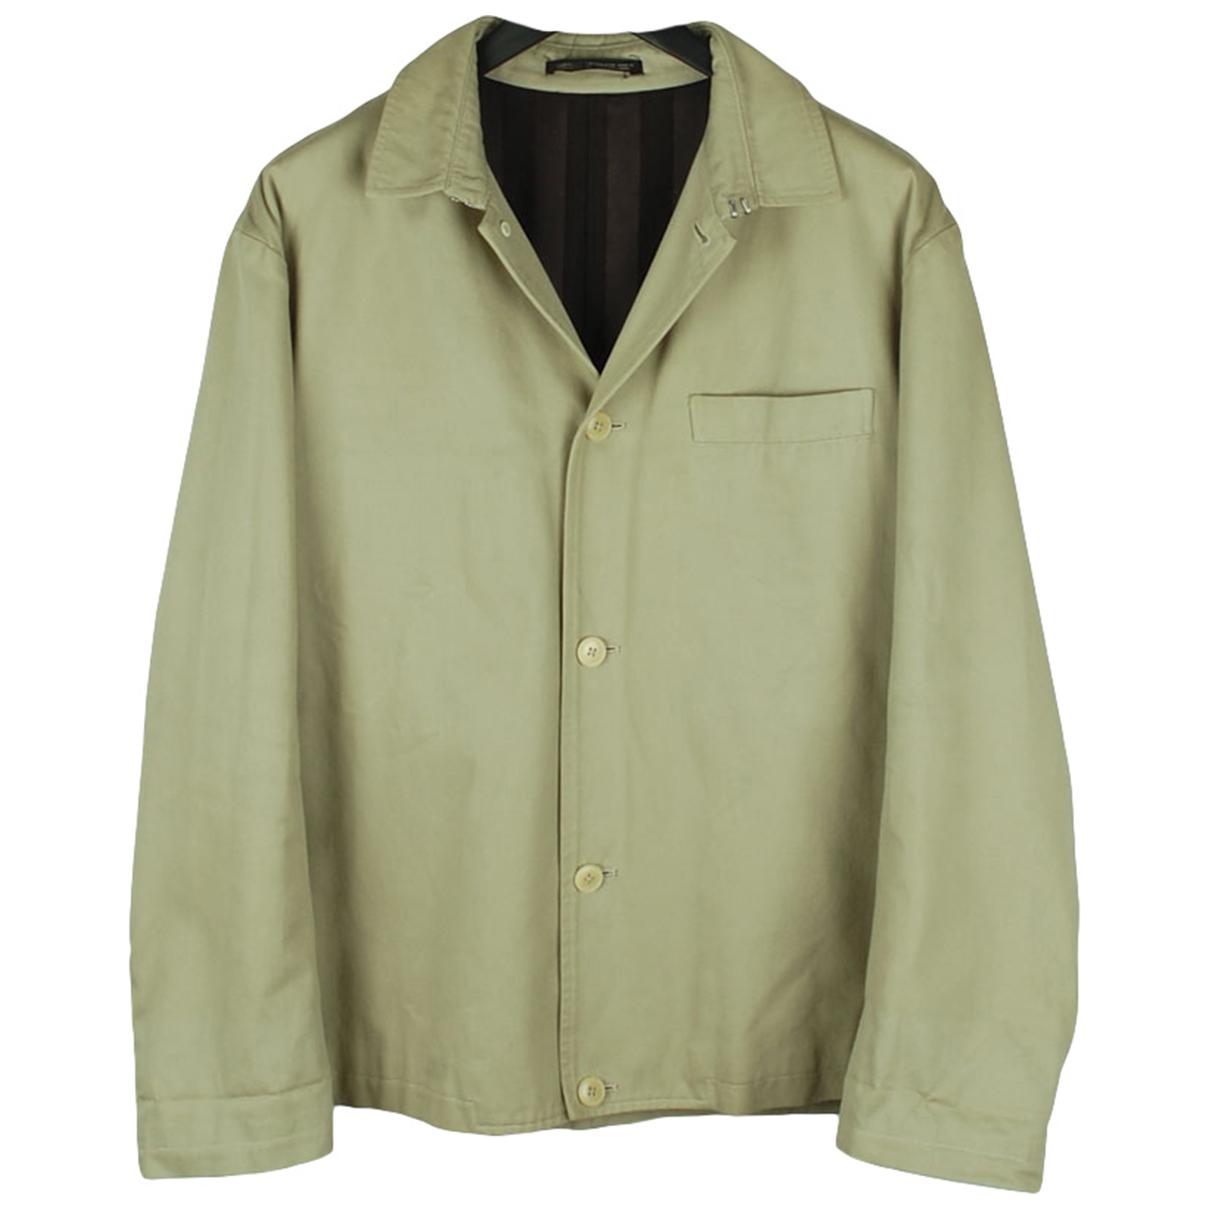 Yohji Yamamoto \N Beige Cotton jacket  for Men M International